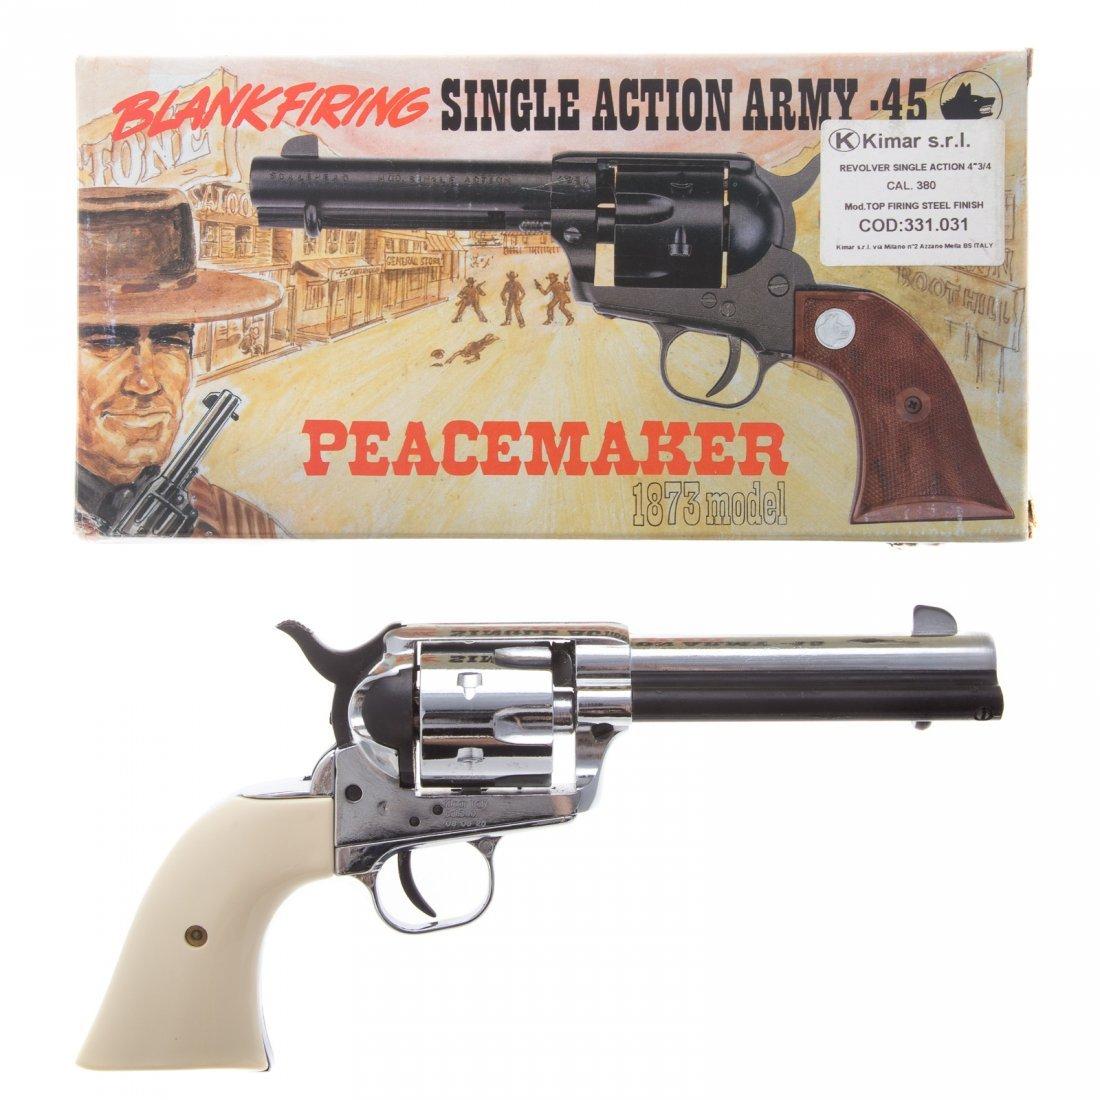 Kimar 380 caliber, model 1873 Peacemaker